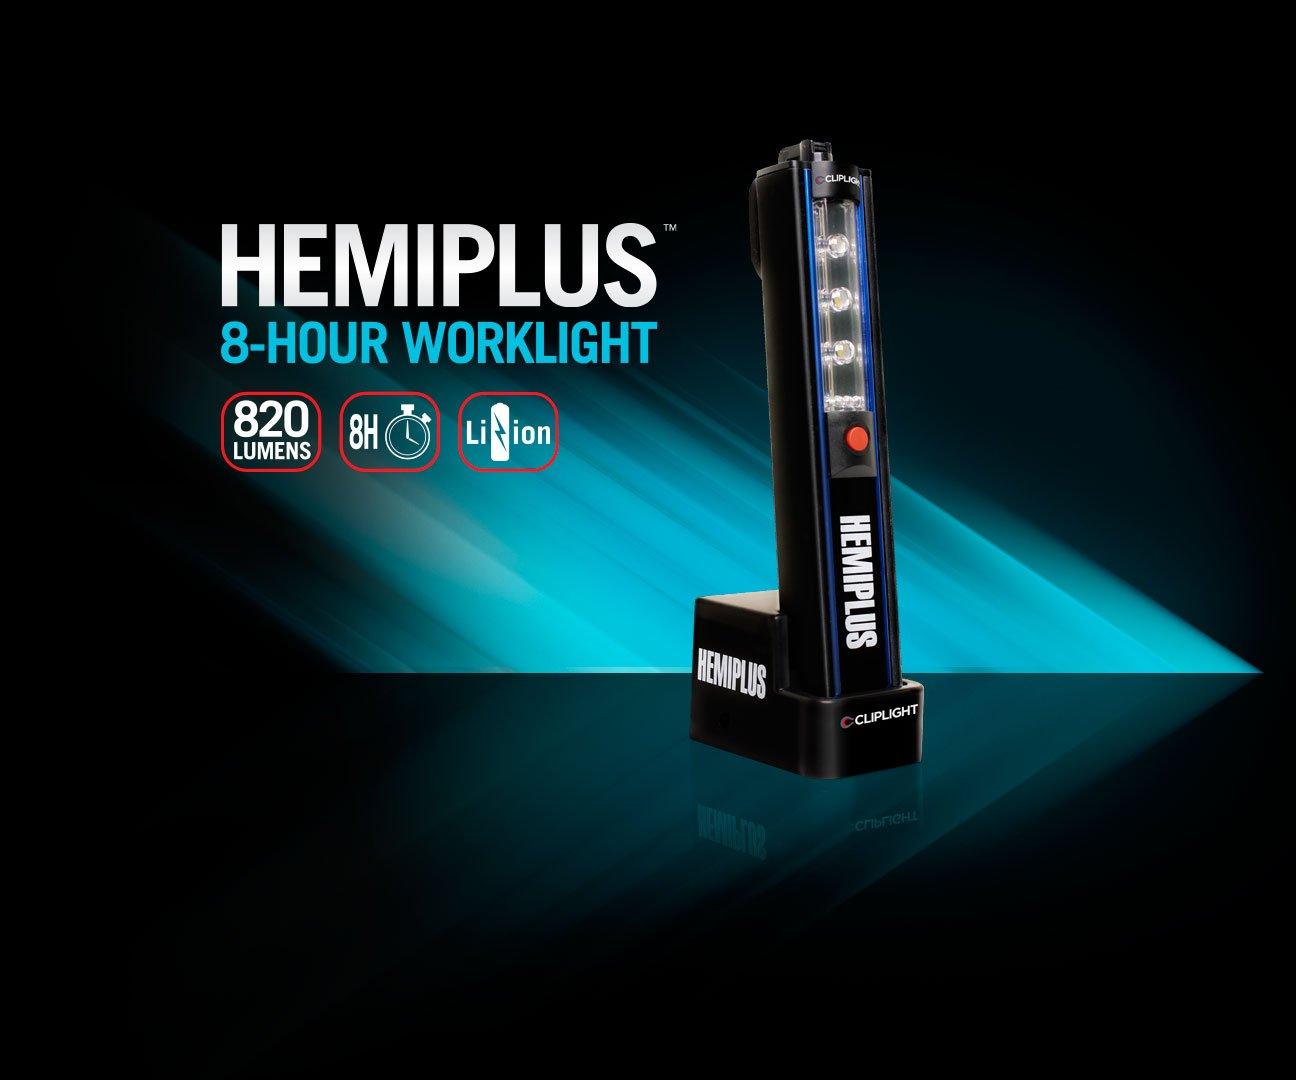 Hemiplus